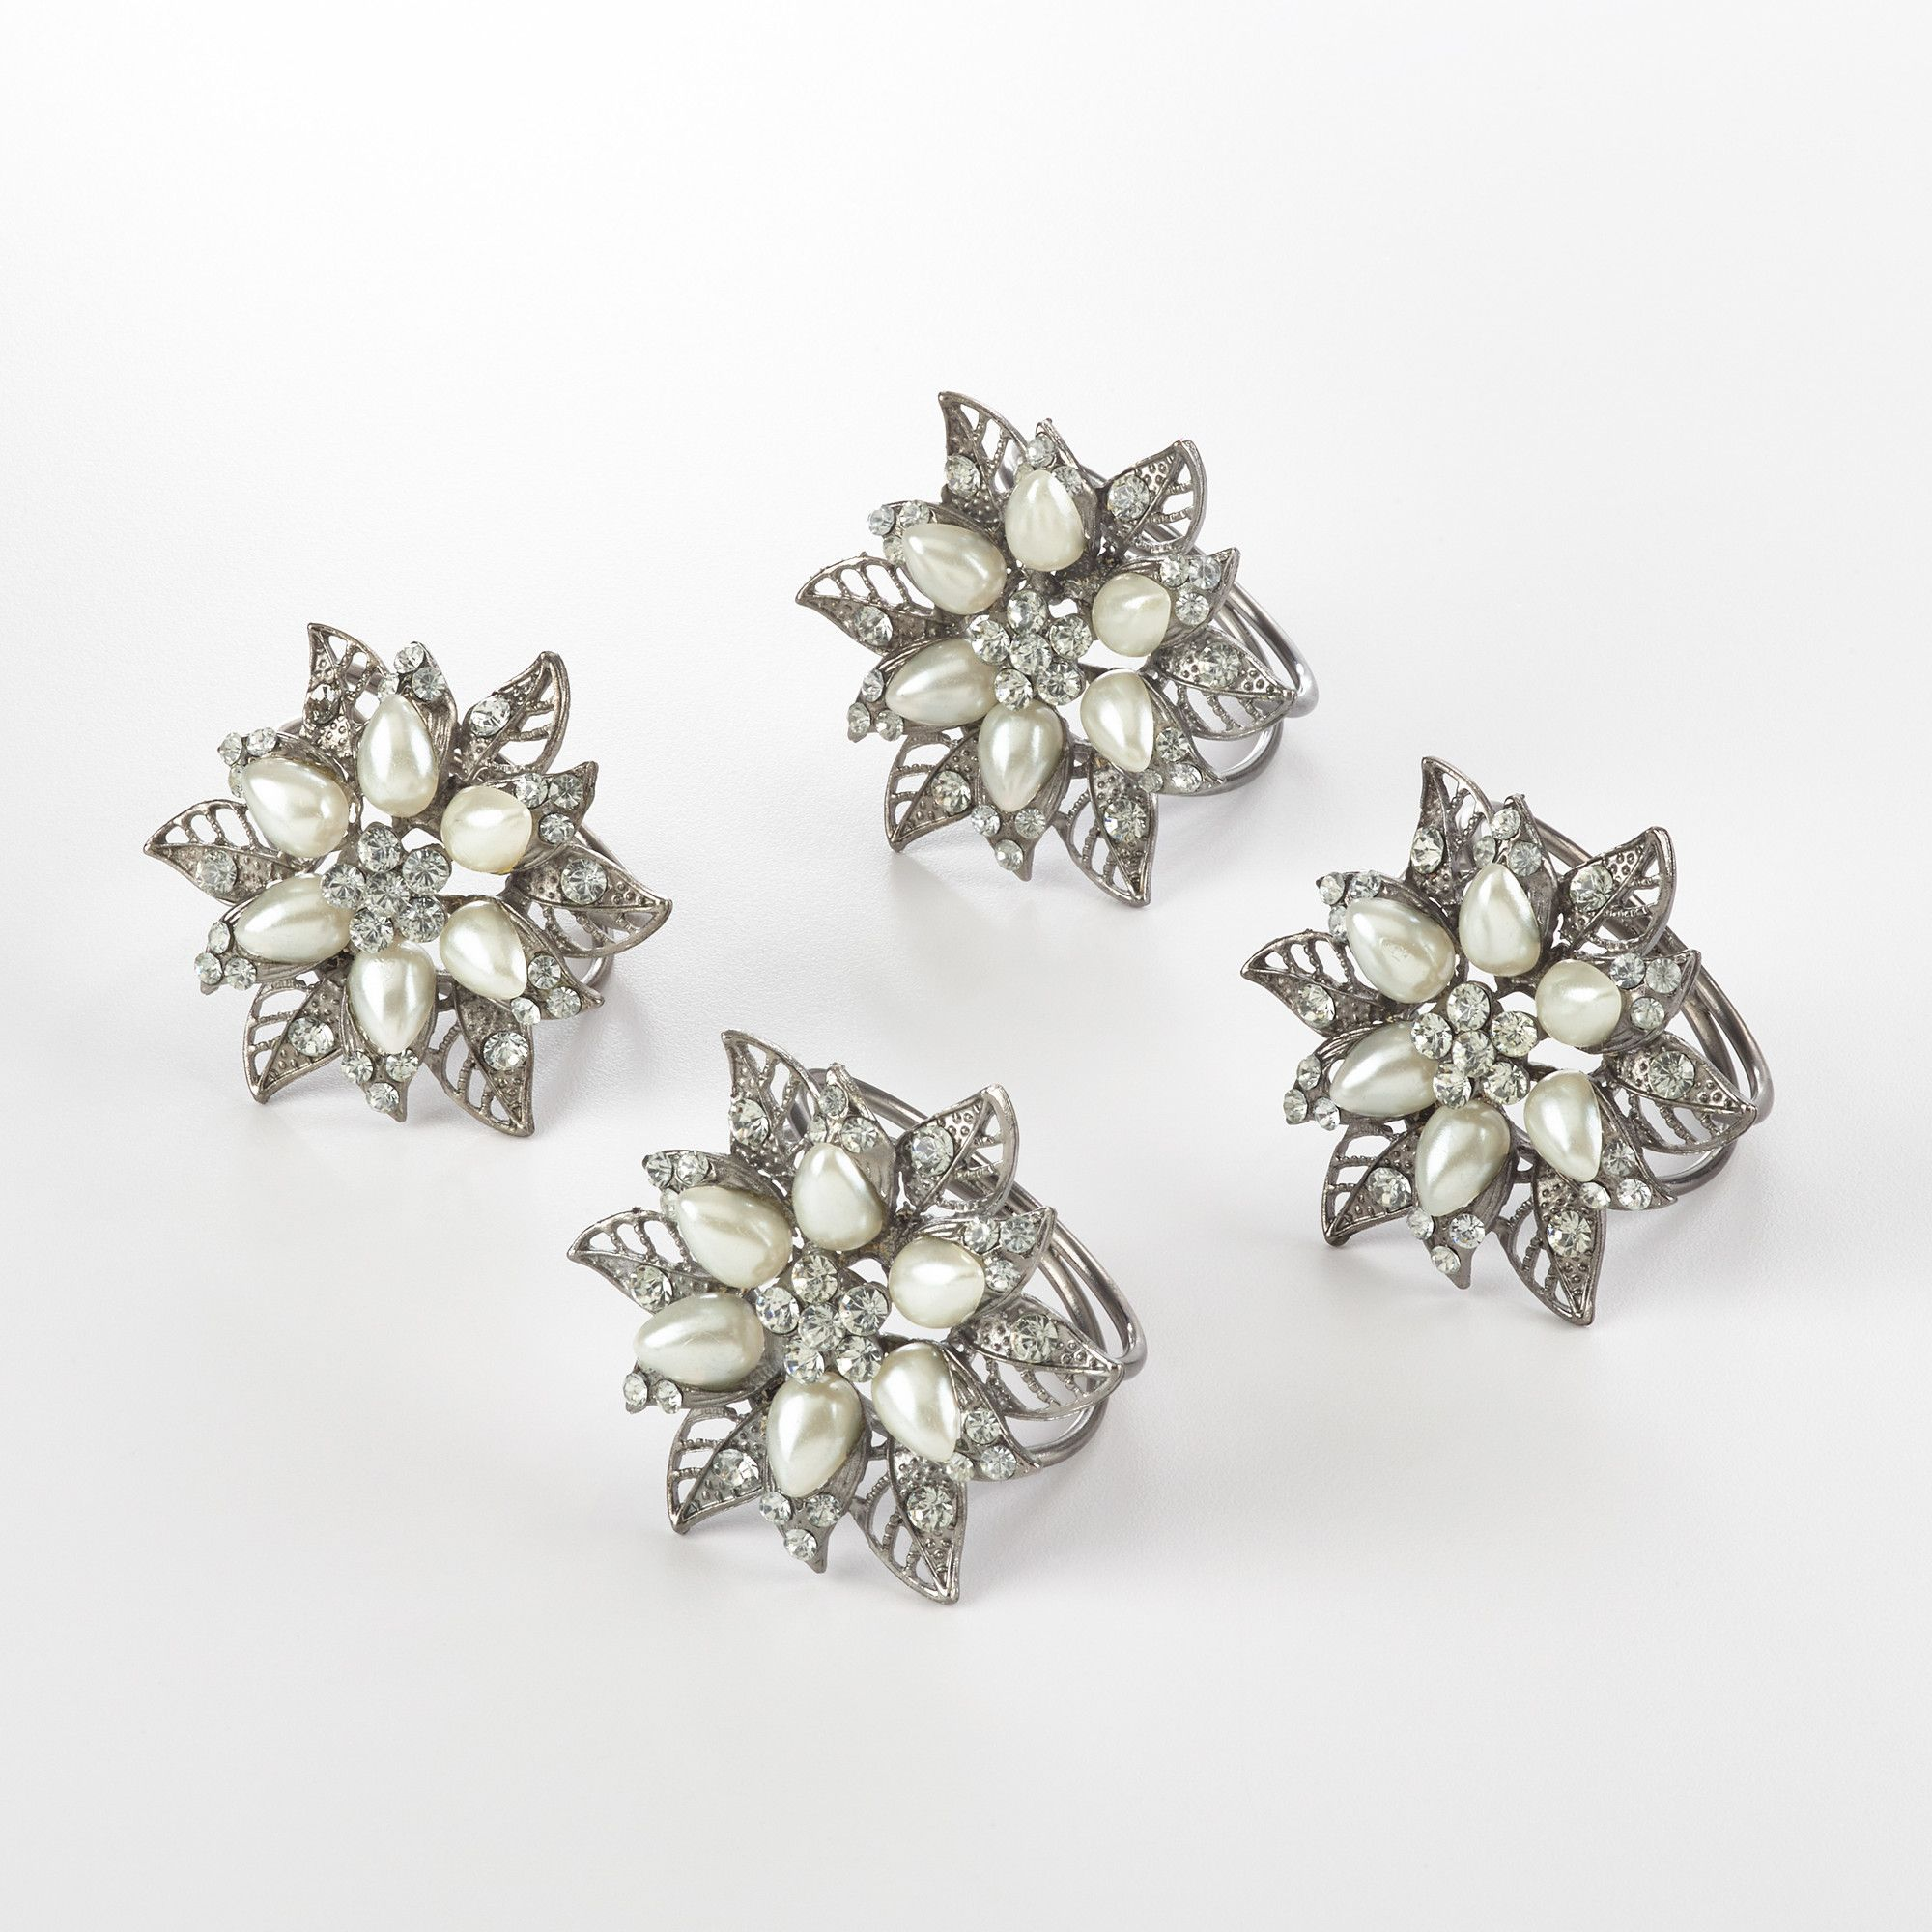 Bejeweled Napkin Ring